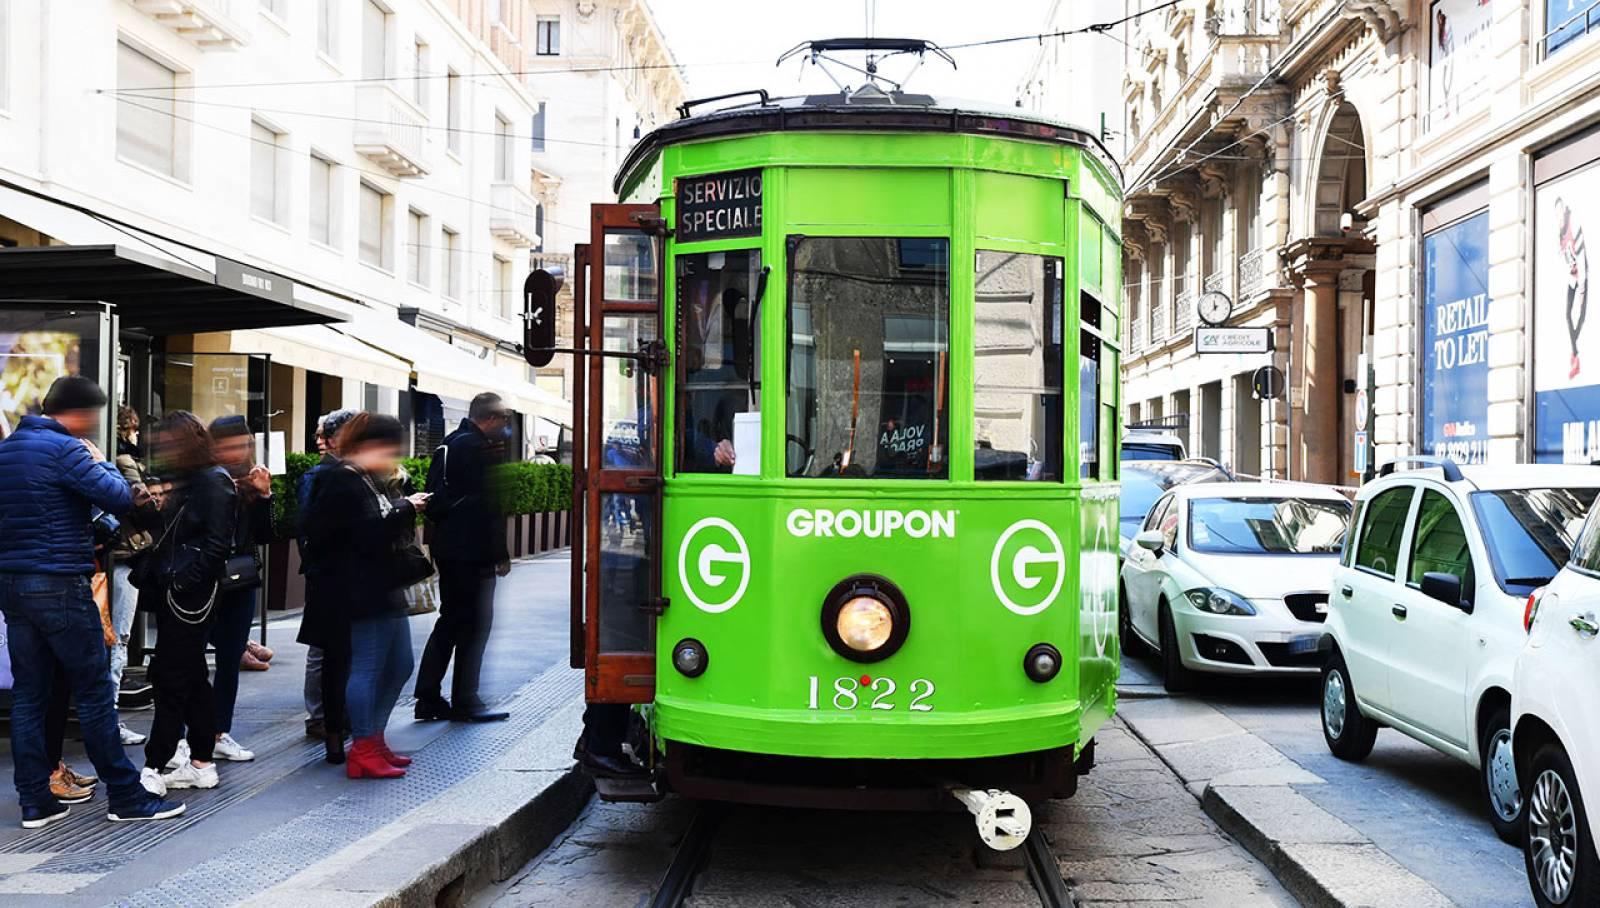 IGPDecaux Milano tram speciale per Groupon